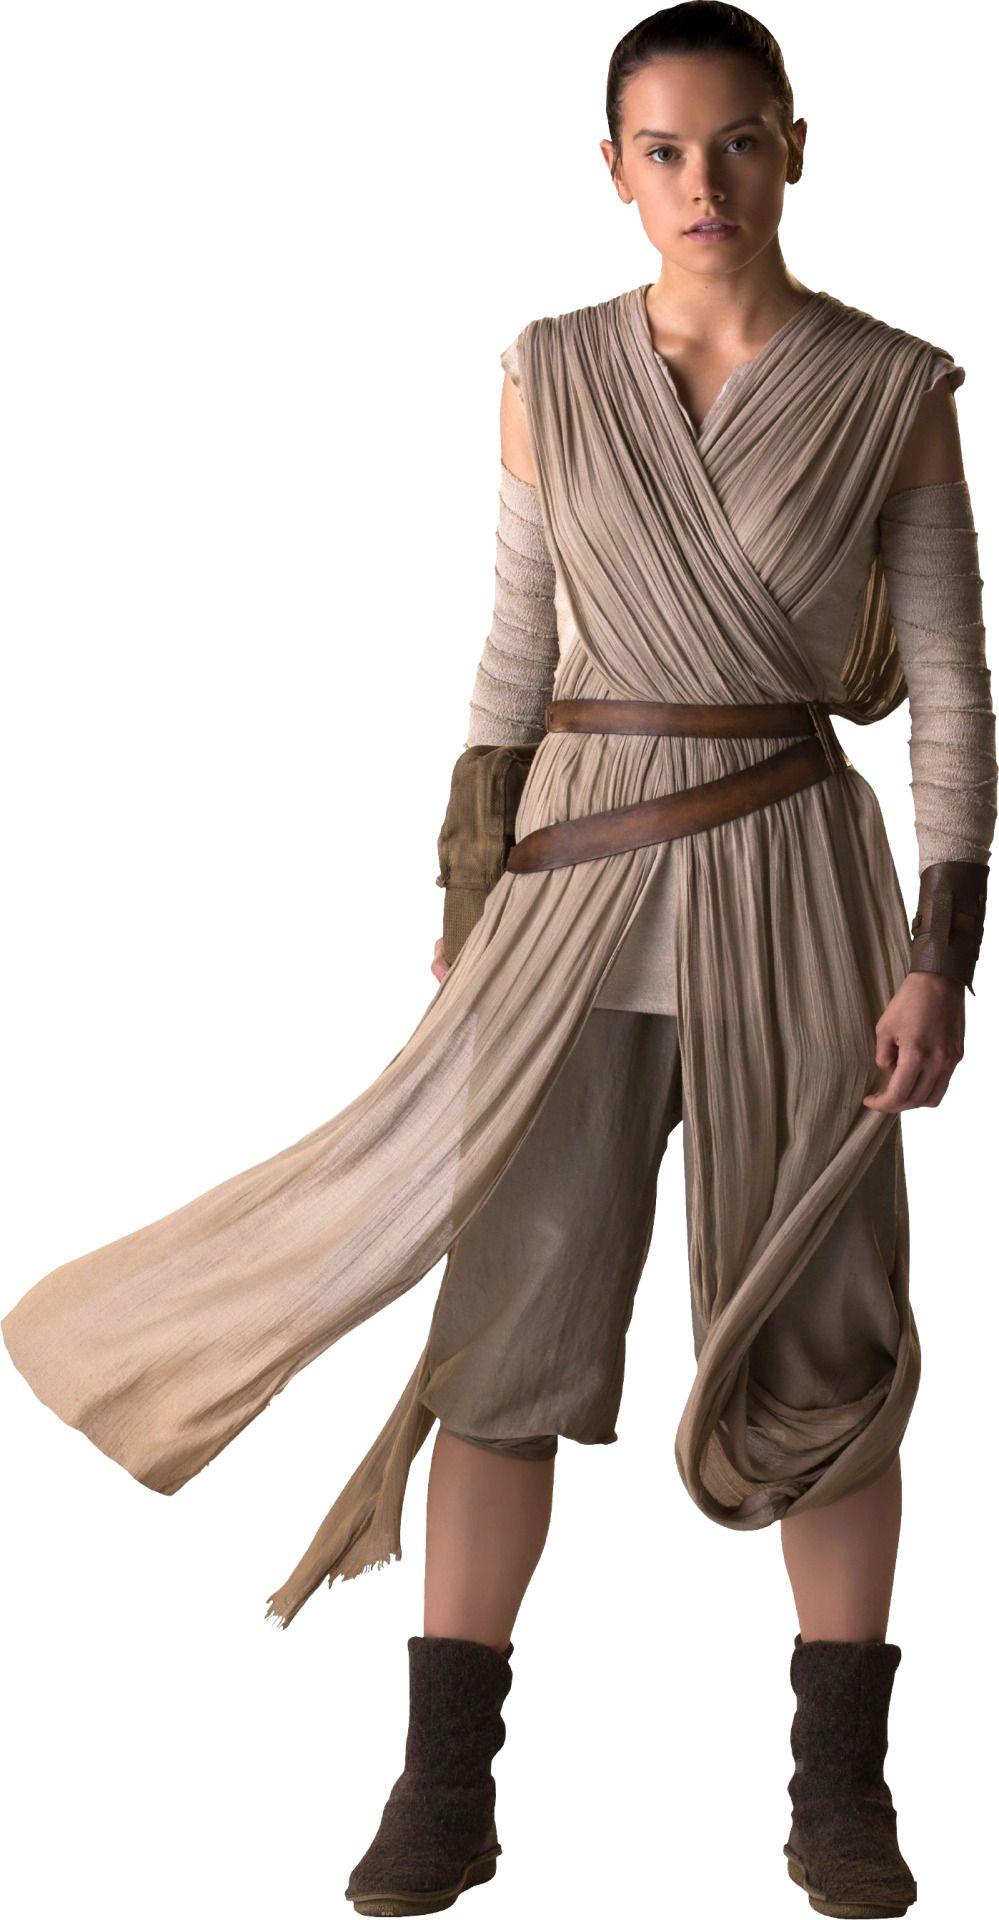 The Force Awakens Cosplay Luke Skywalker Costume Original Ver Outfits Star Wars